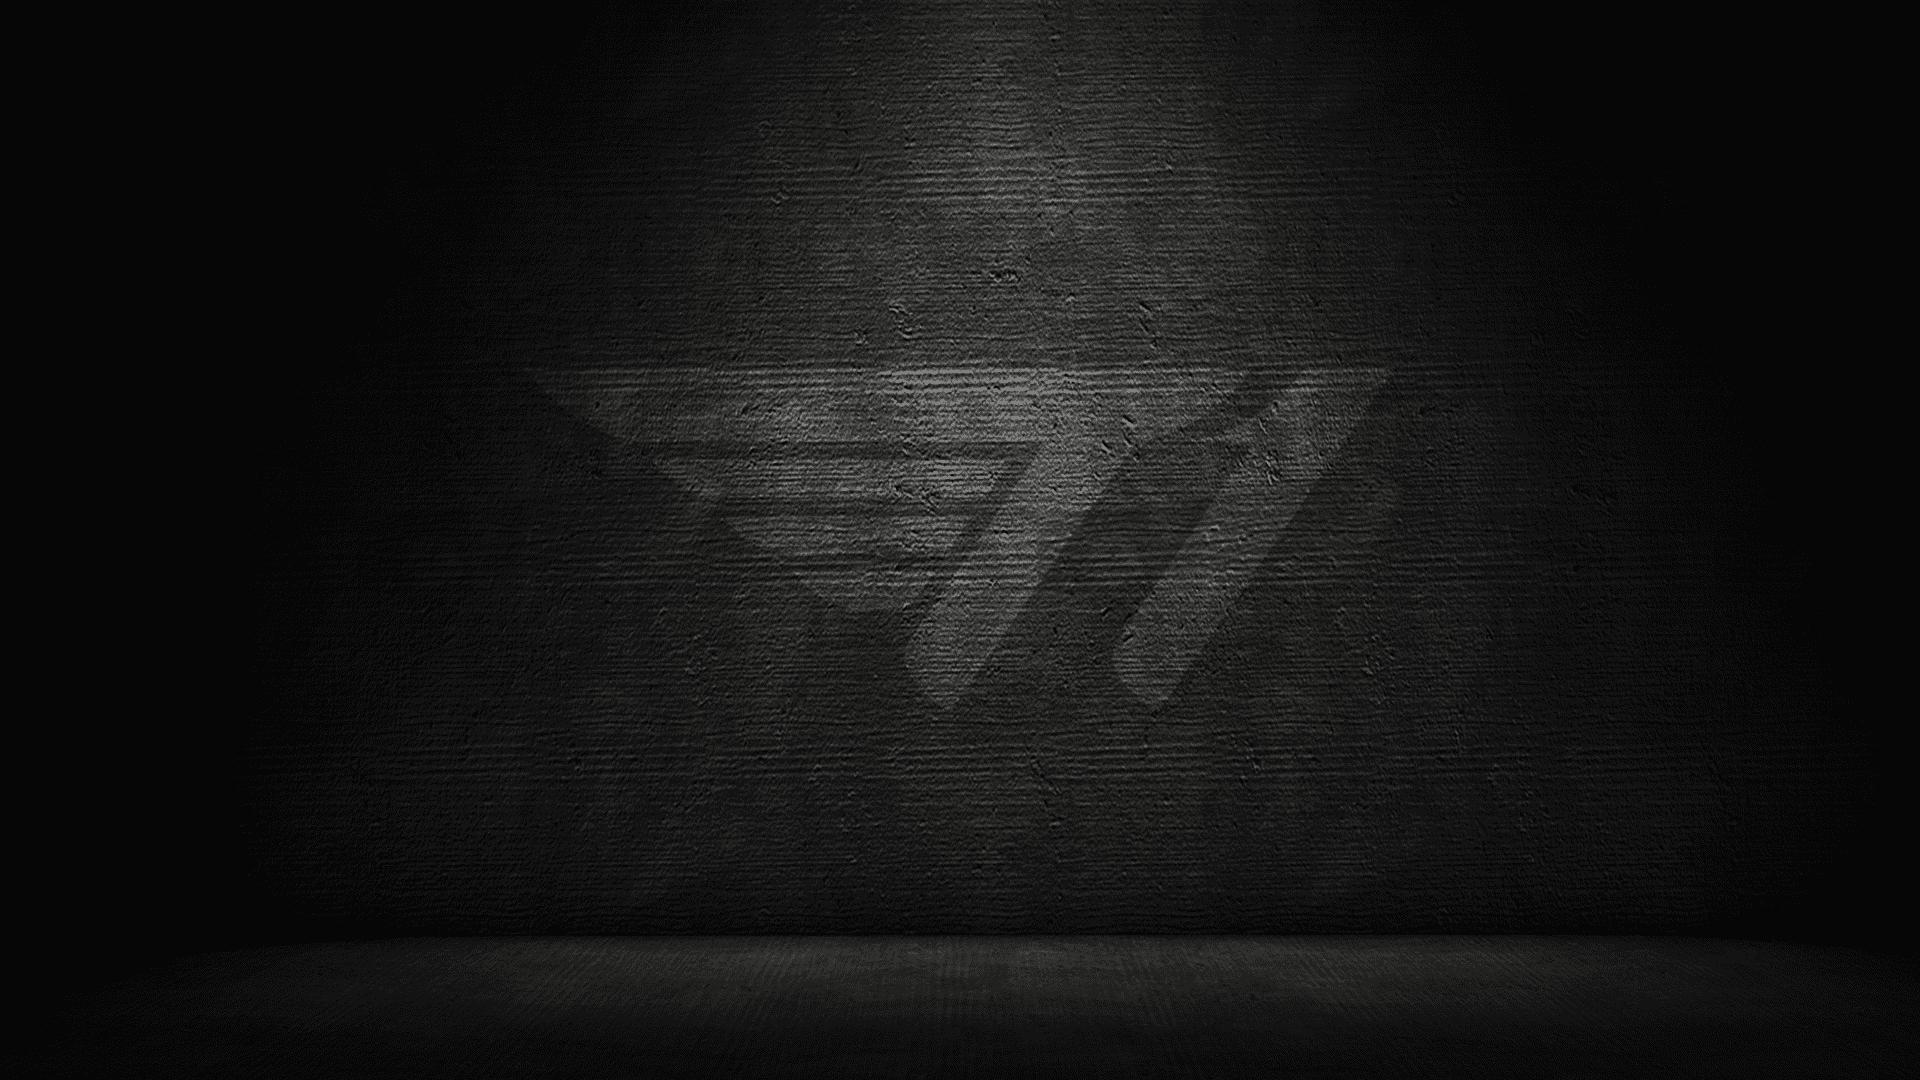 Team Wallpaper - T1, Season 2, #1